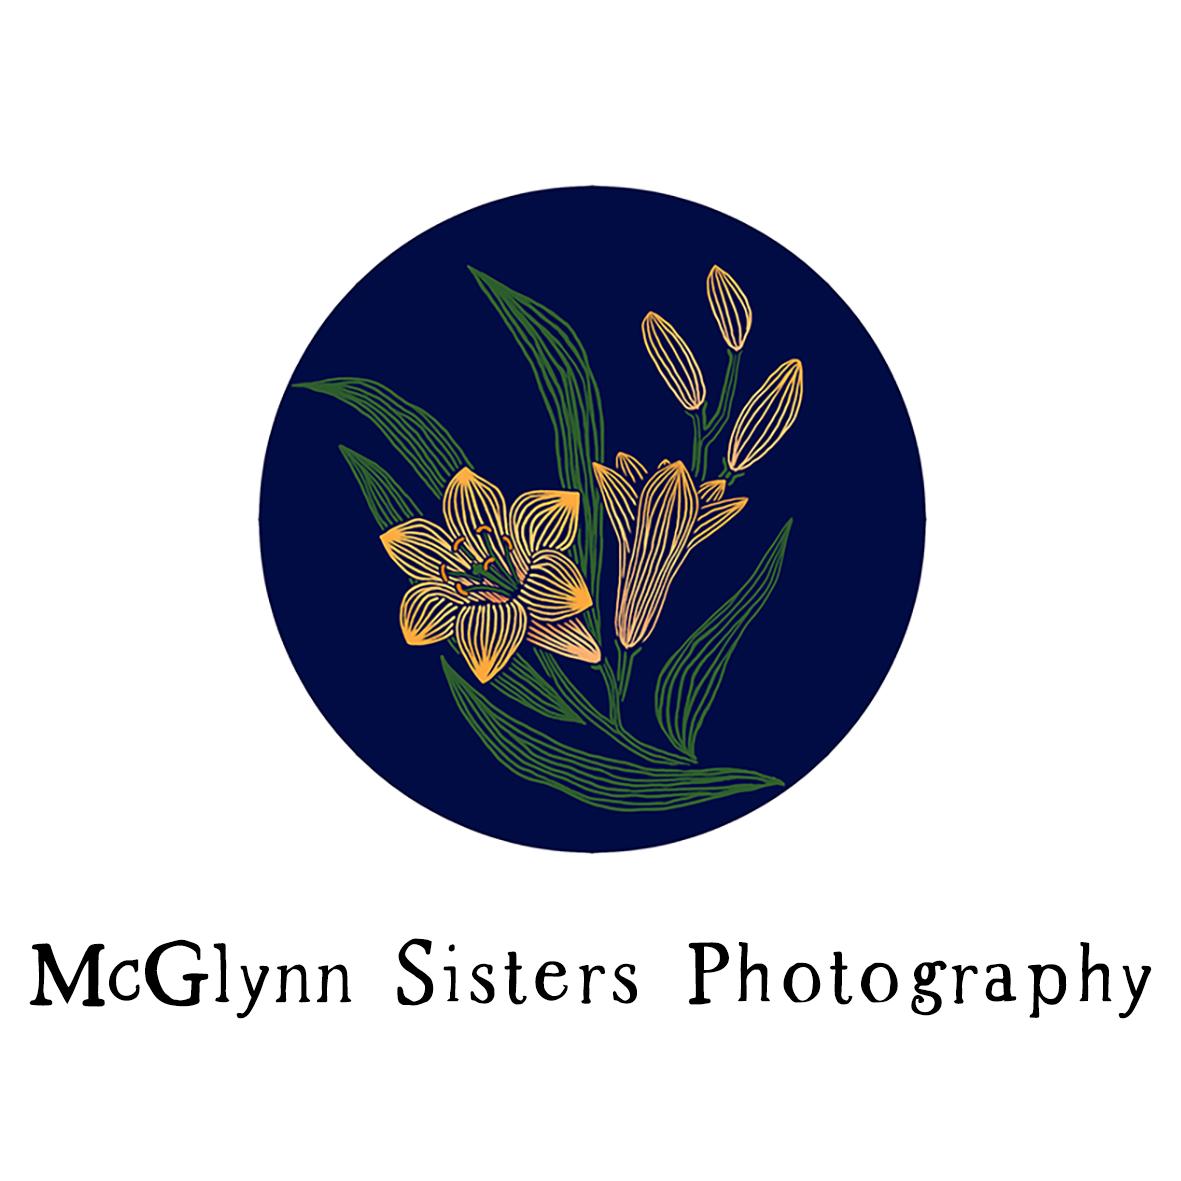 McGlynn Sisters